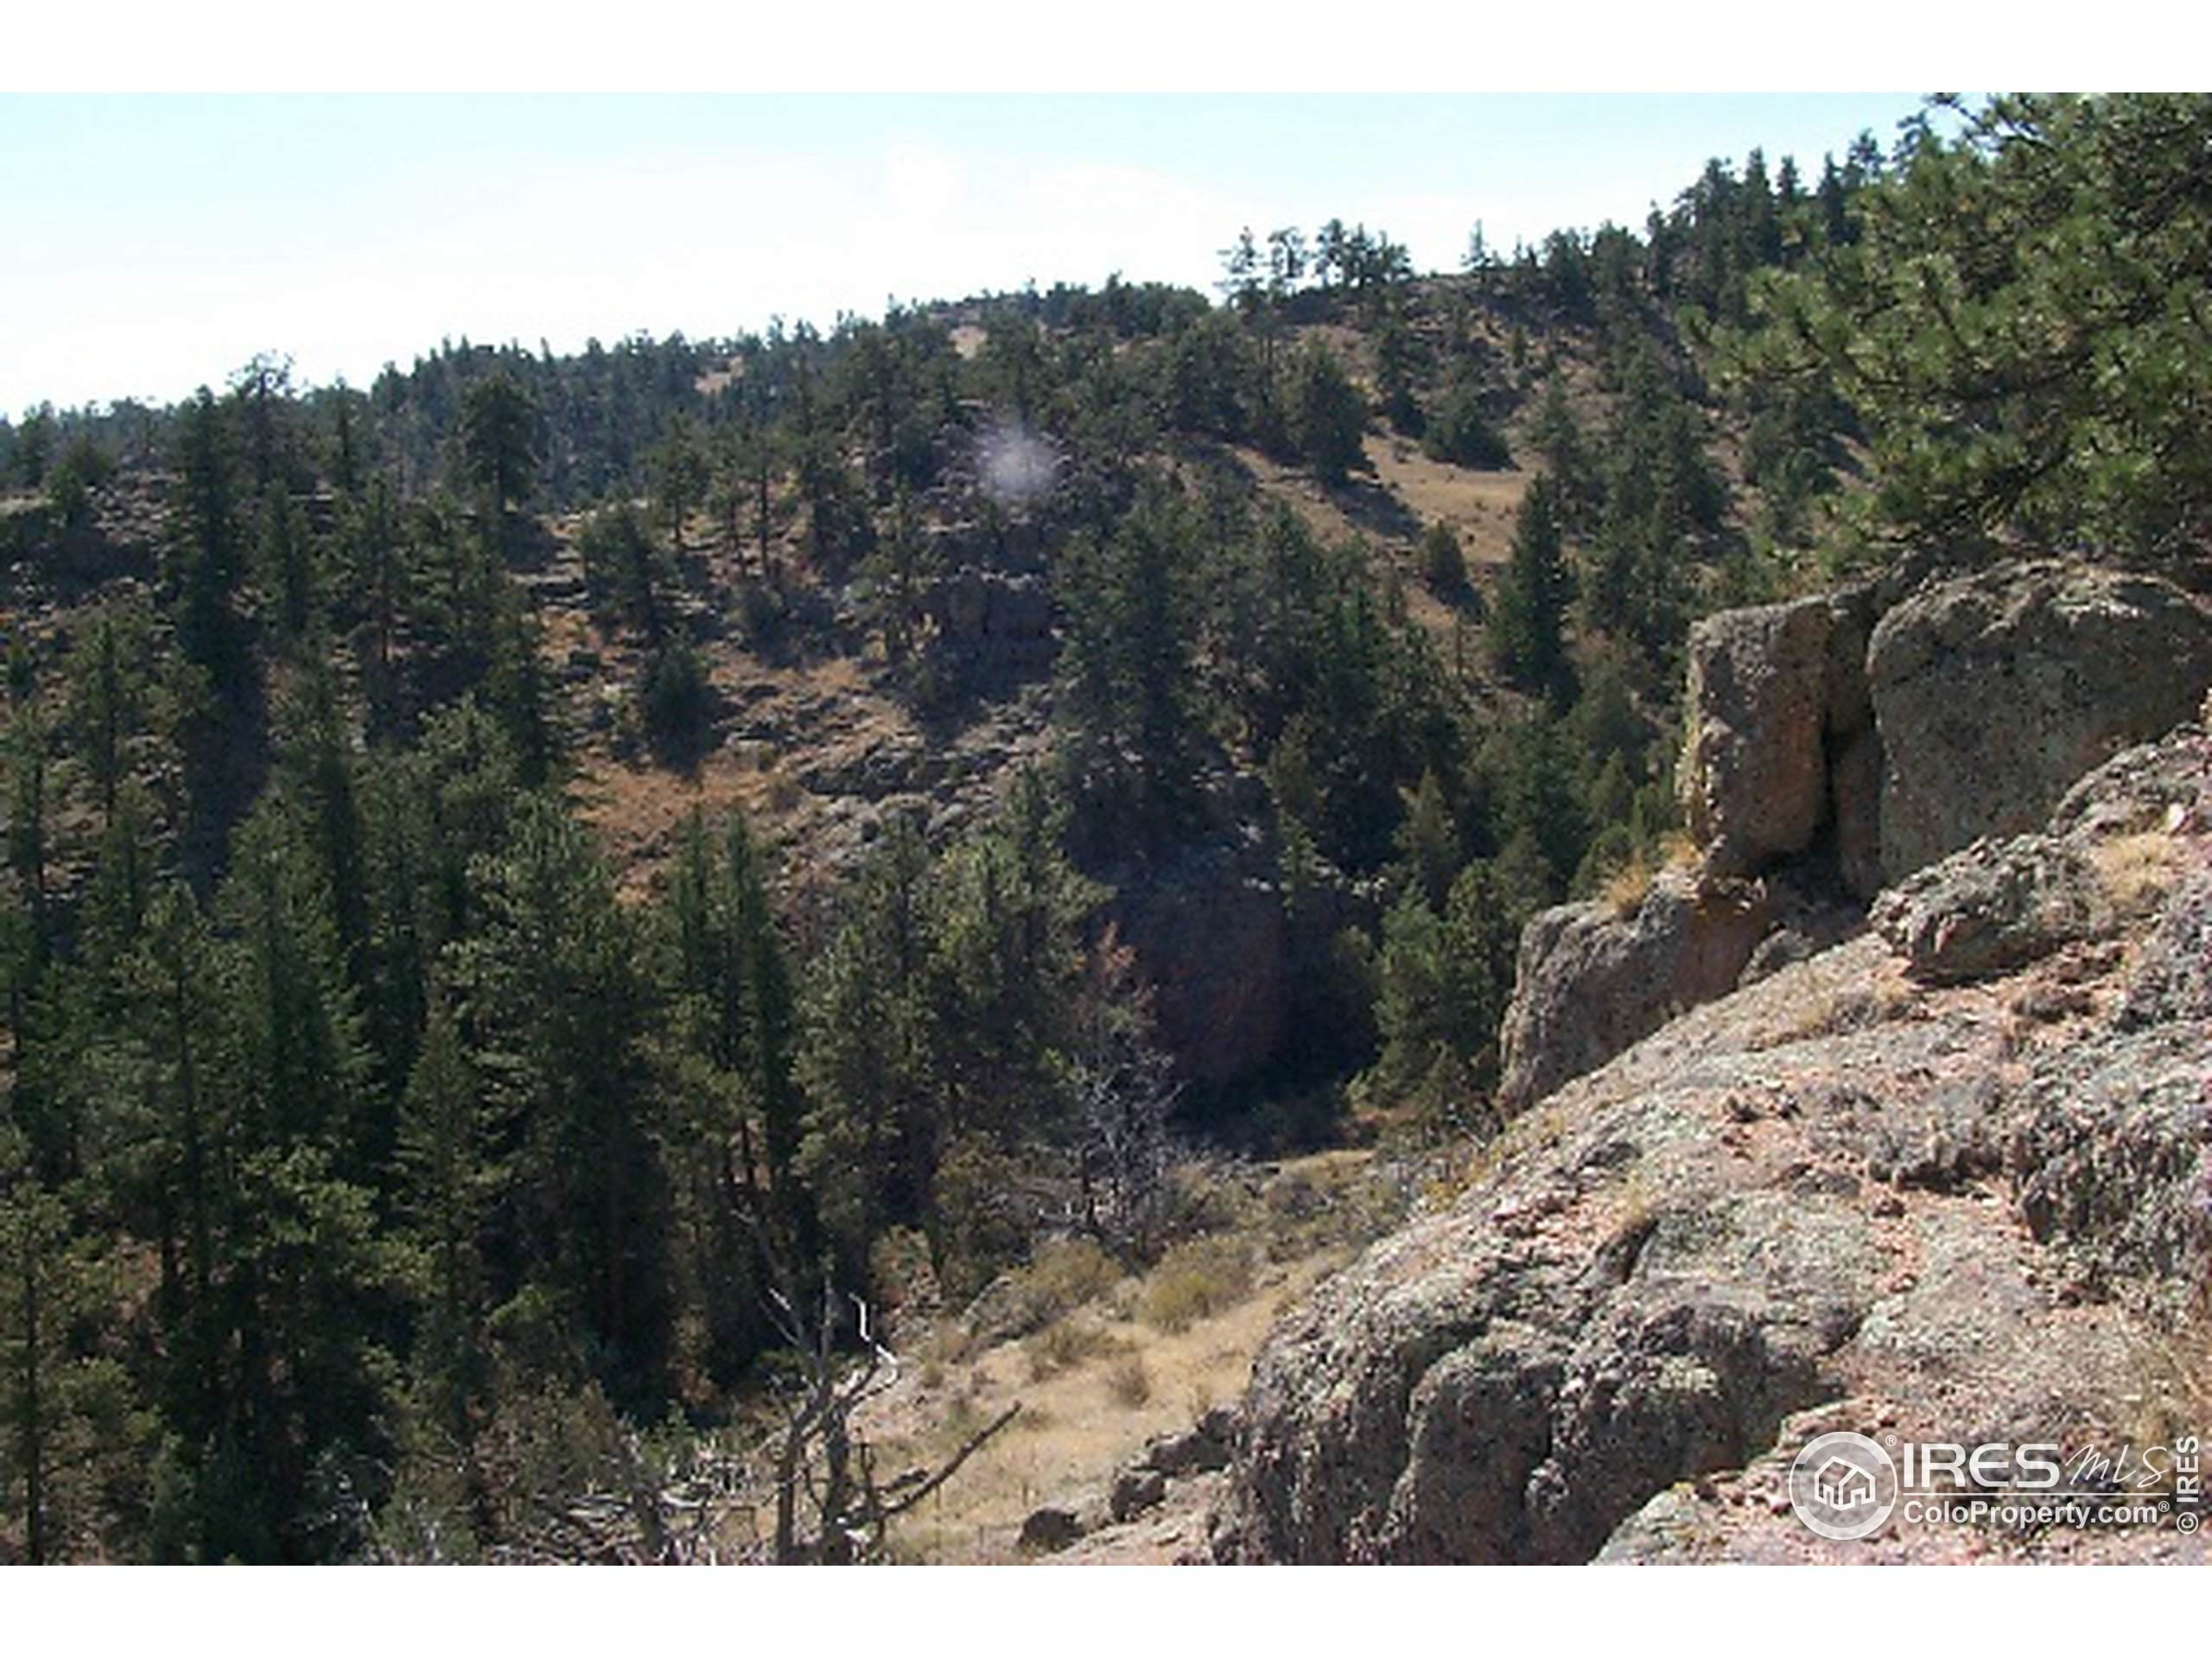 709 Kohlor Dr, Lafayette, CO 80026 (MLS #925753) :: HomeSmart Realty Group